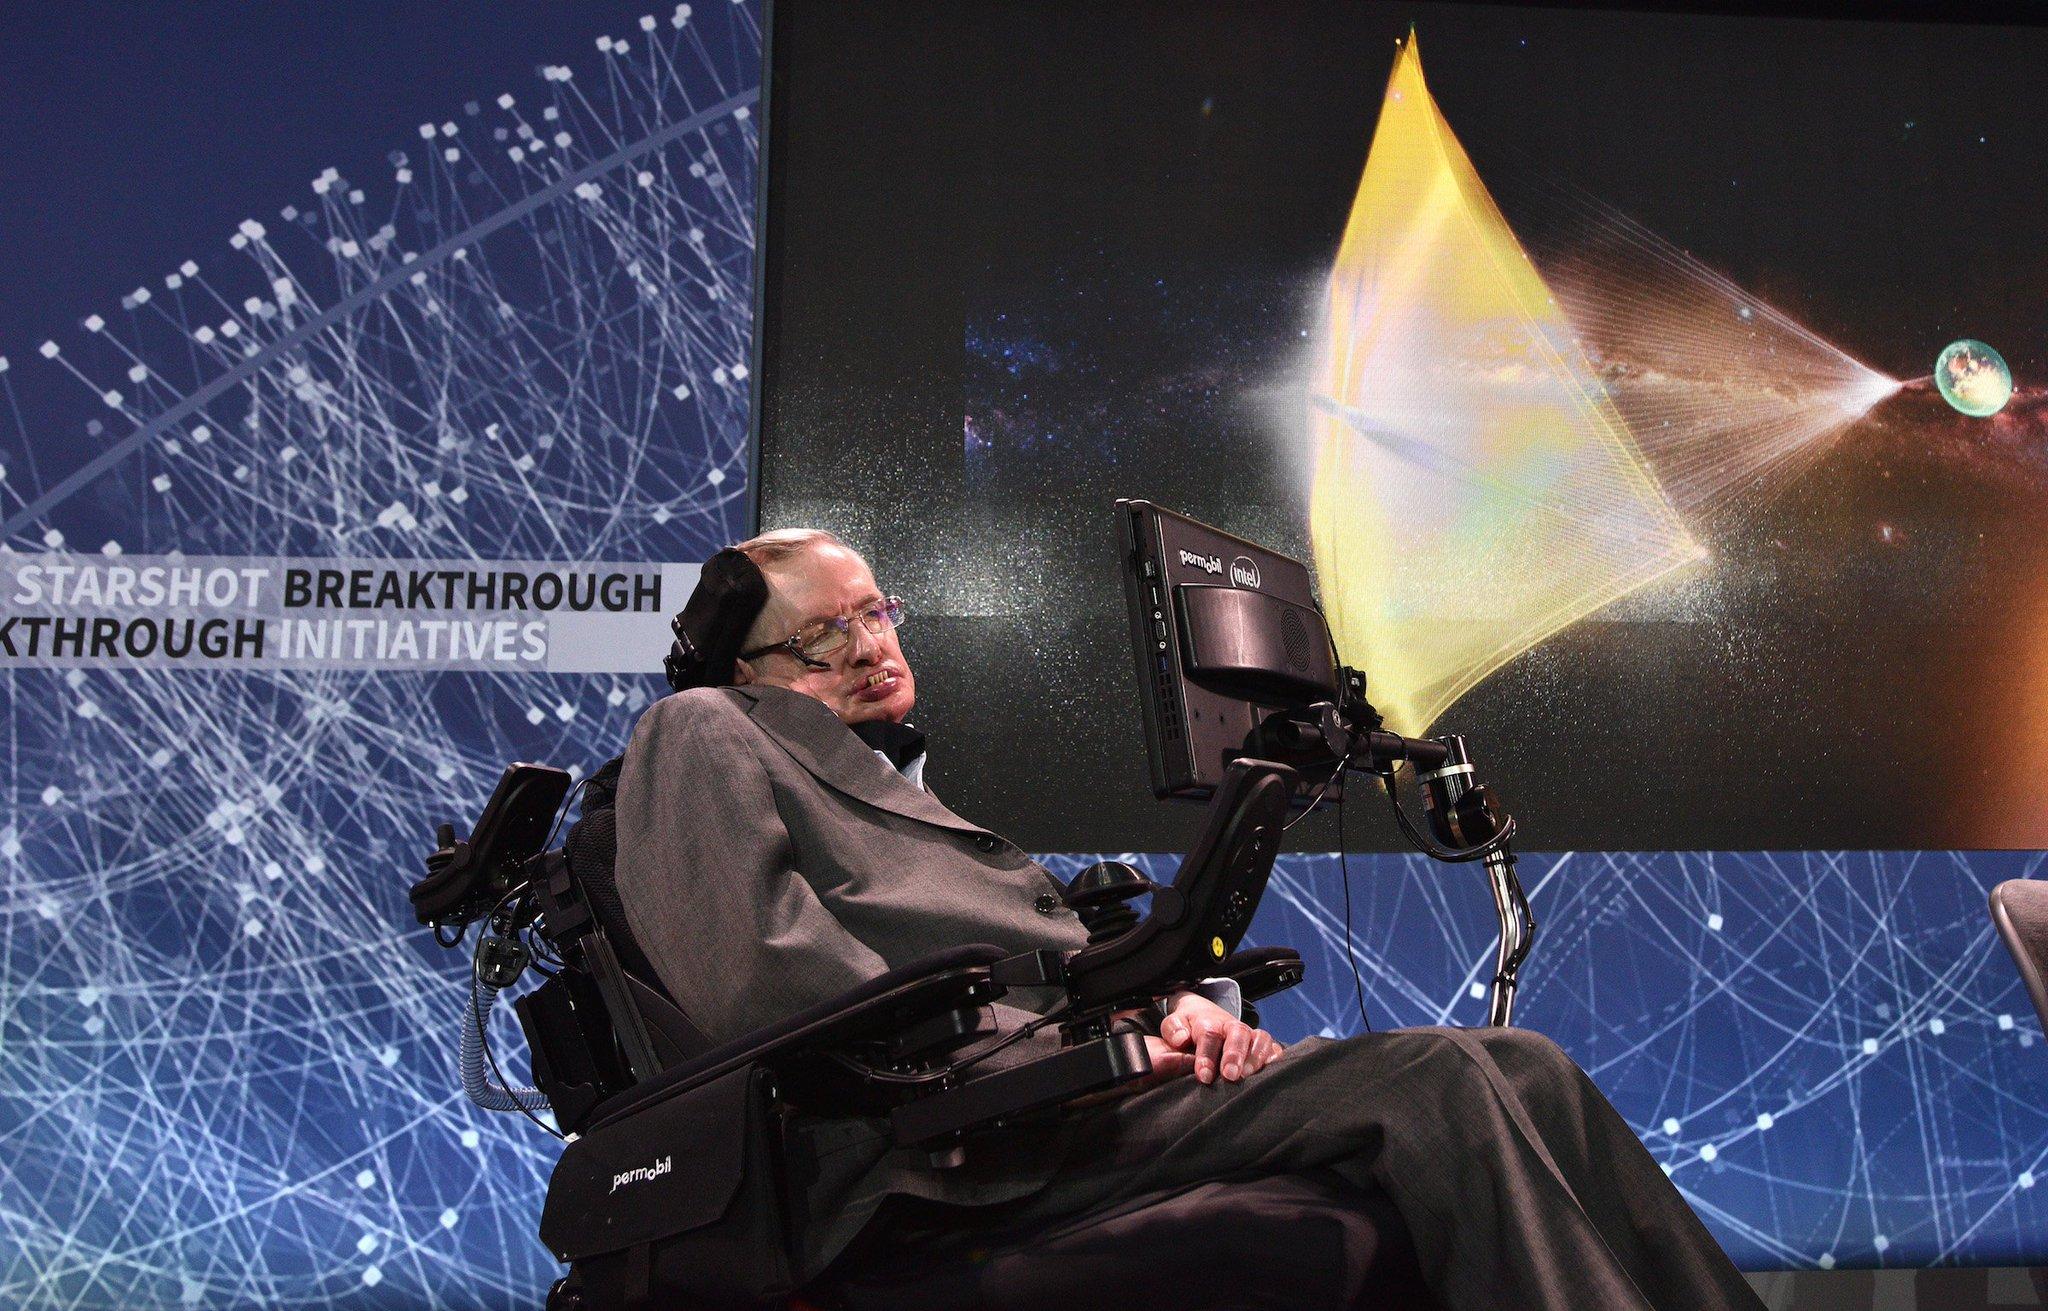 Stephen Hawking has died. https://t.co/AdliRZTDwi https://t.co/MLUY5IpV9V